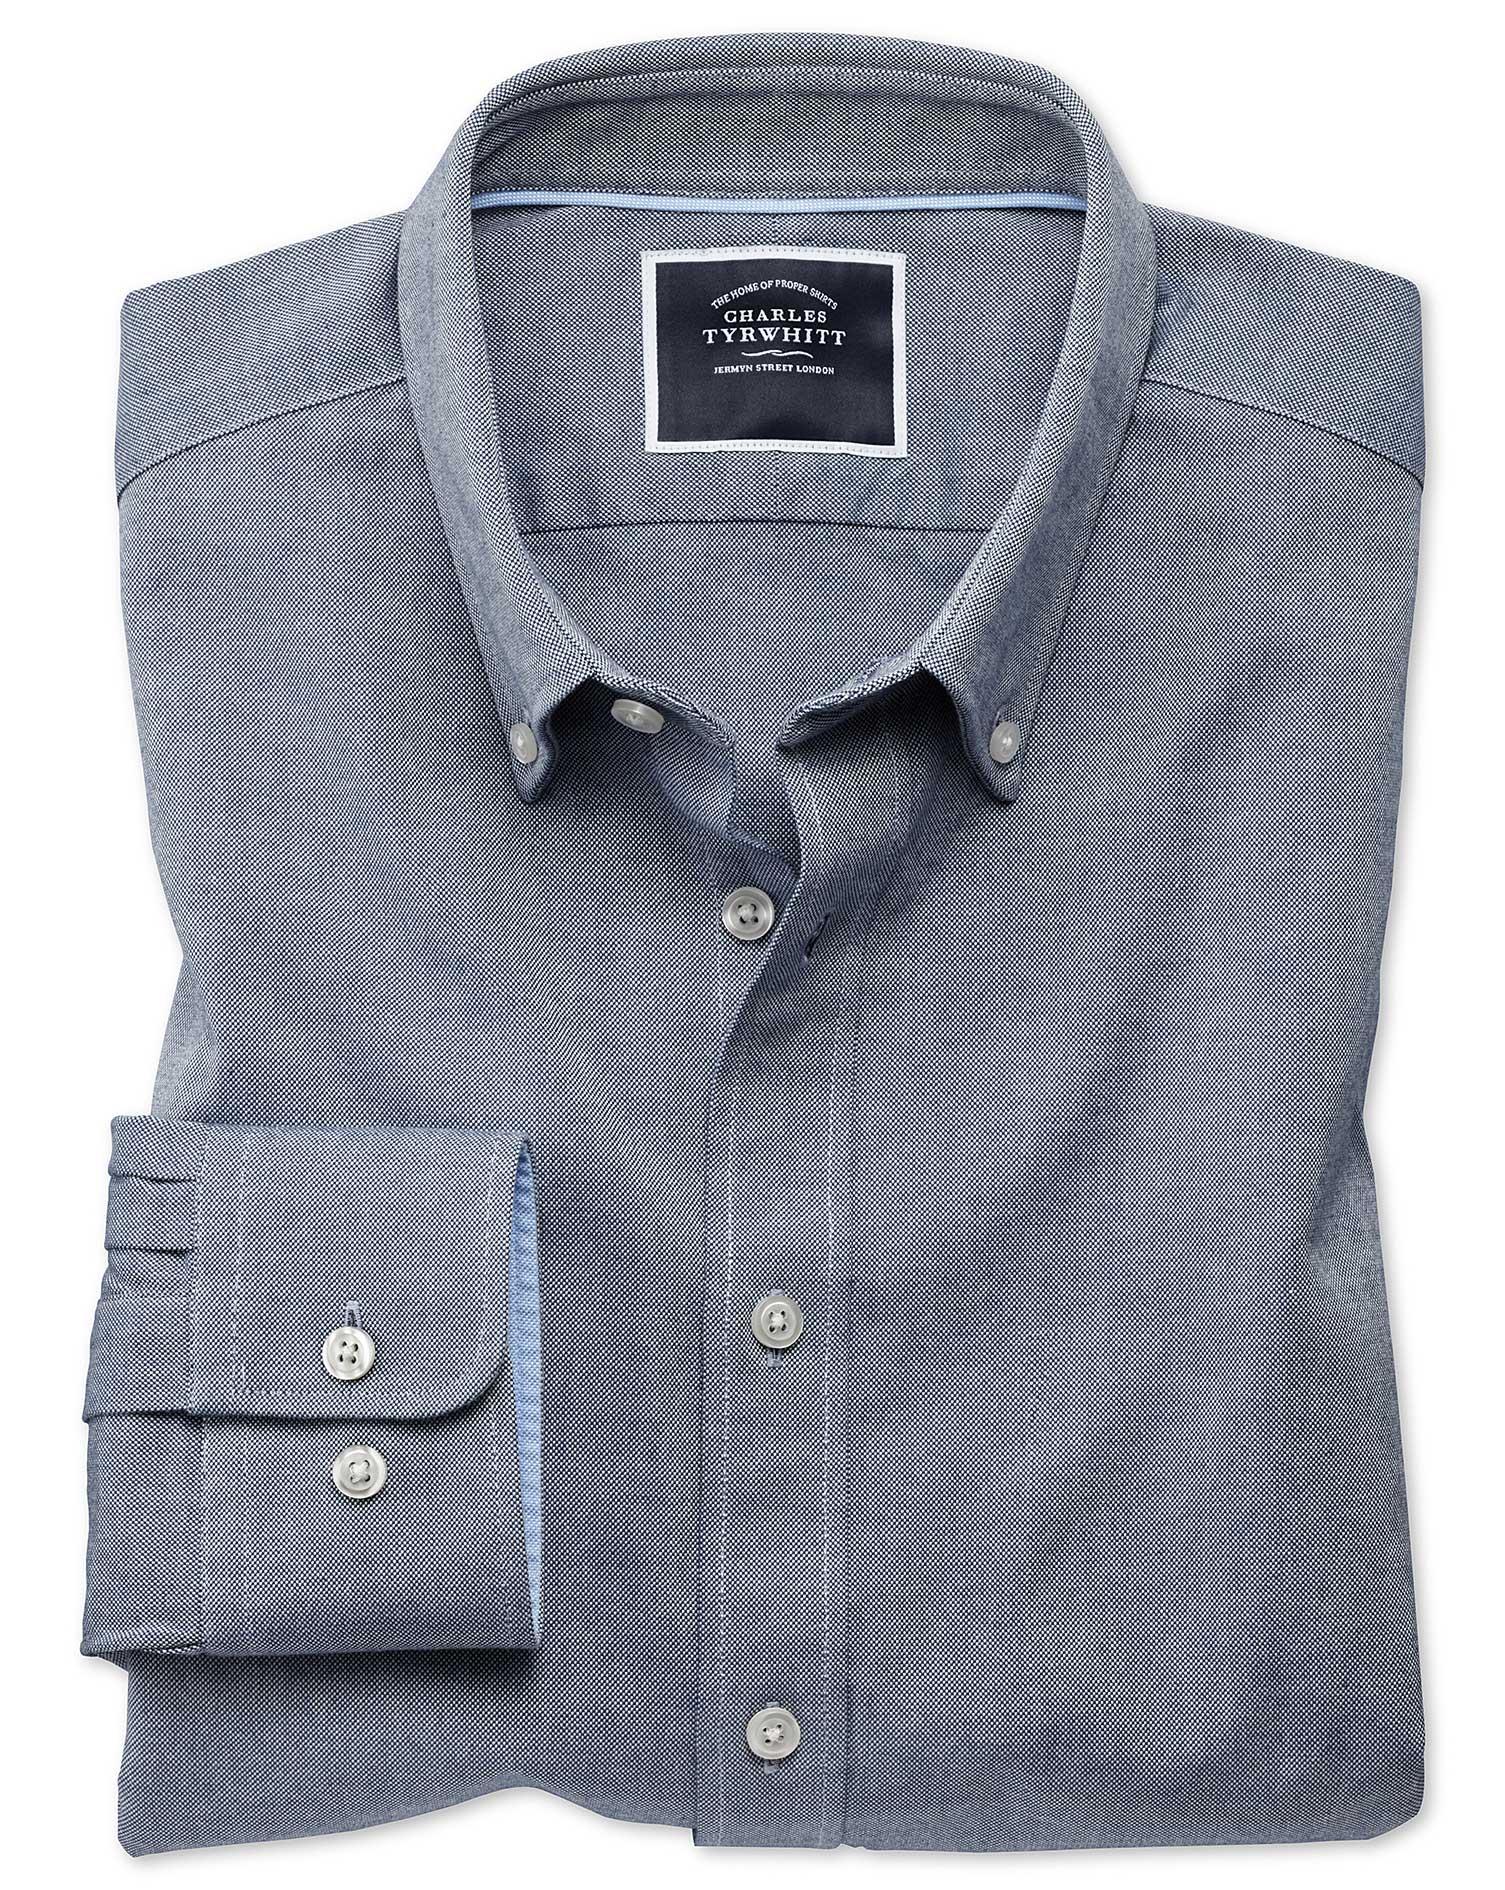 extra slim fit denim blue washed oxford cotton casual shirt single cuff size xl by charles tyrwhitt